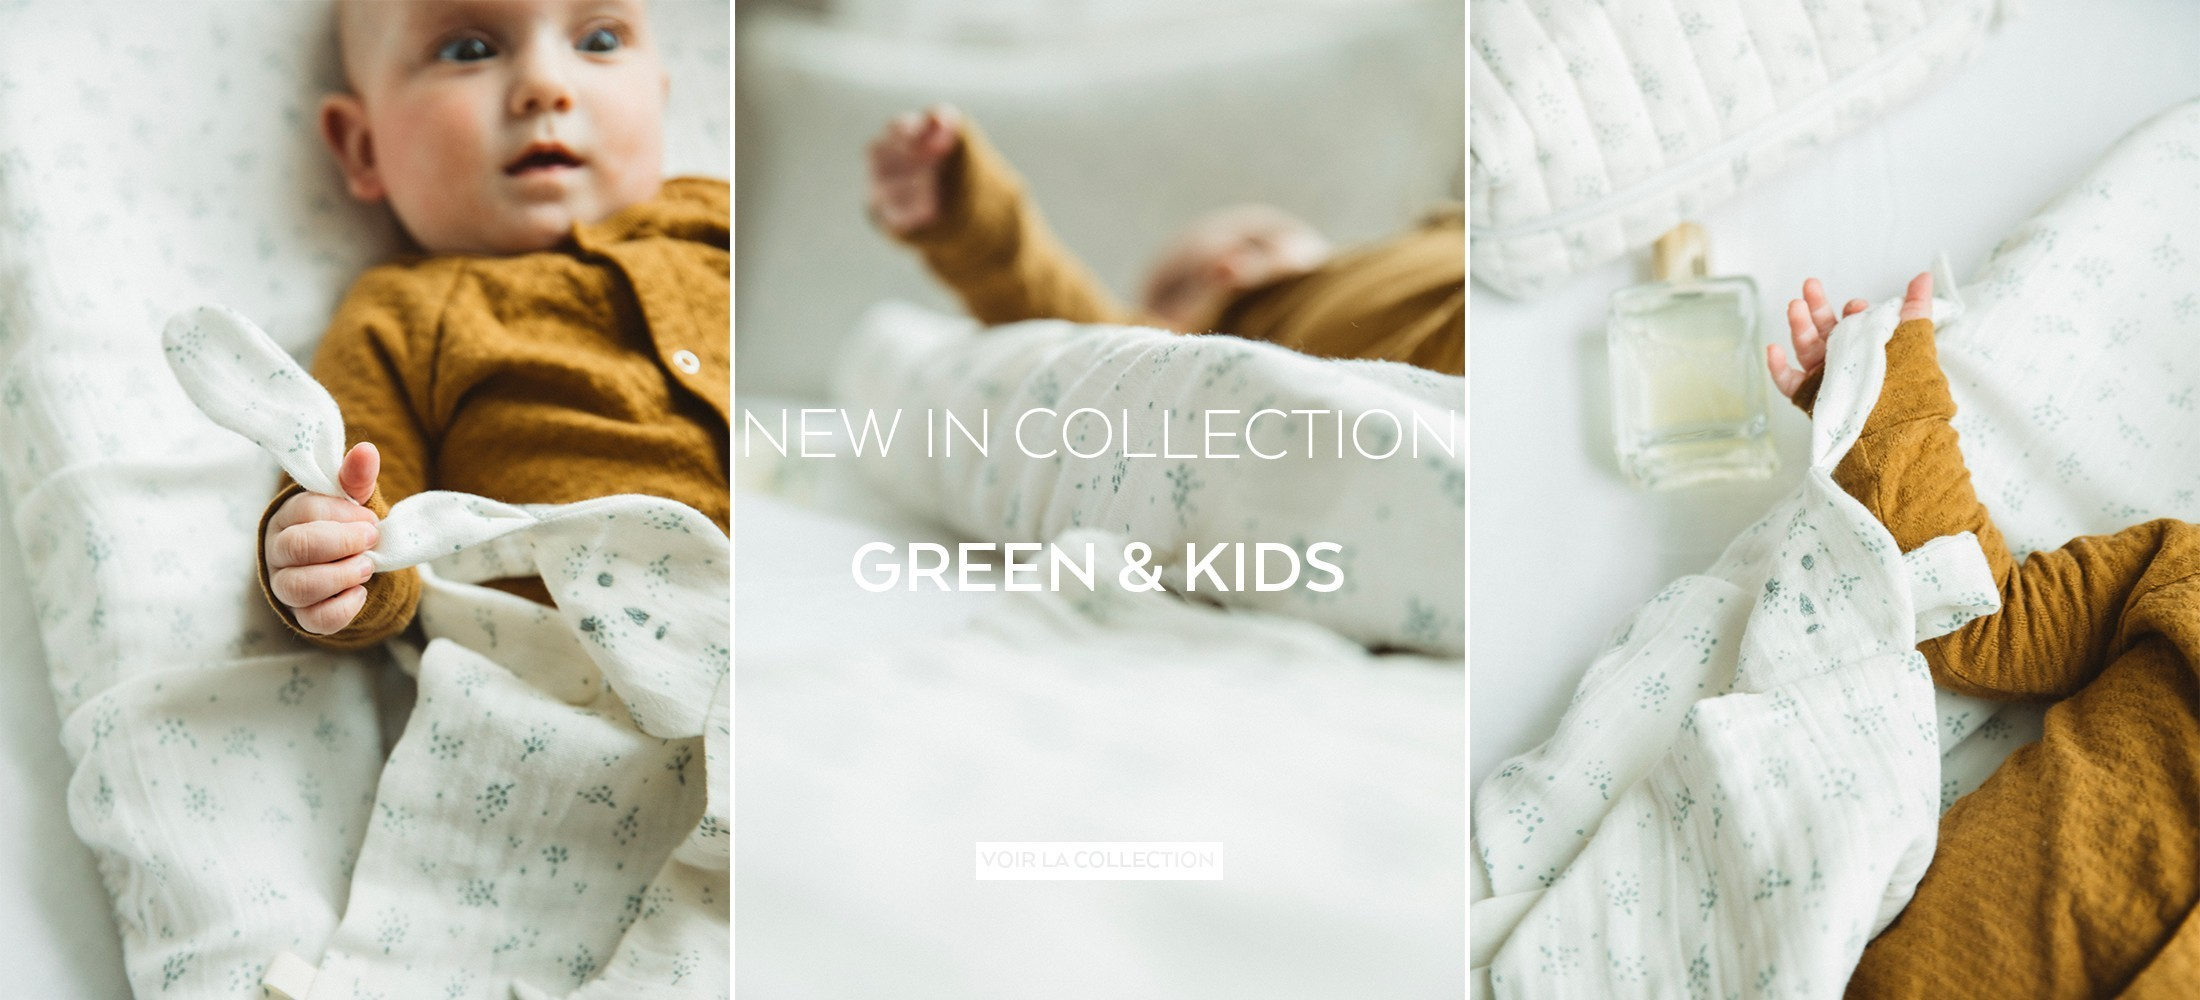 GREEN & KIDS